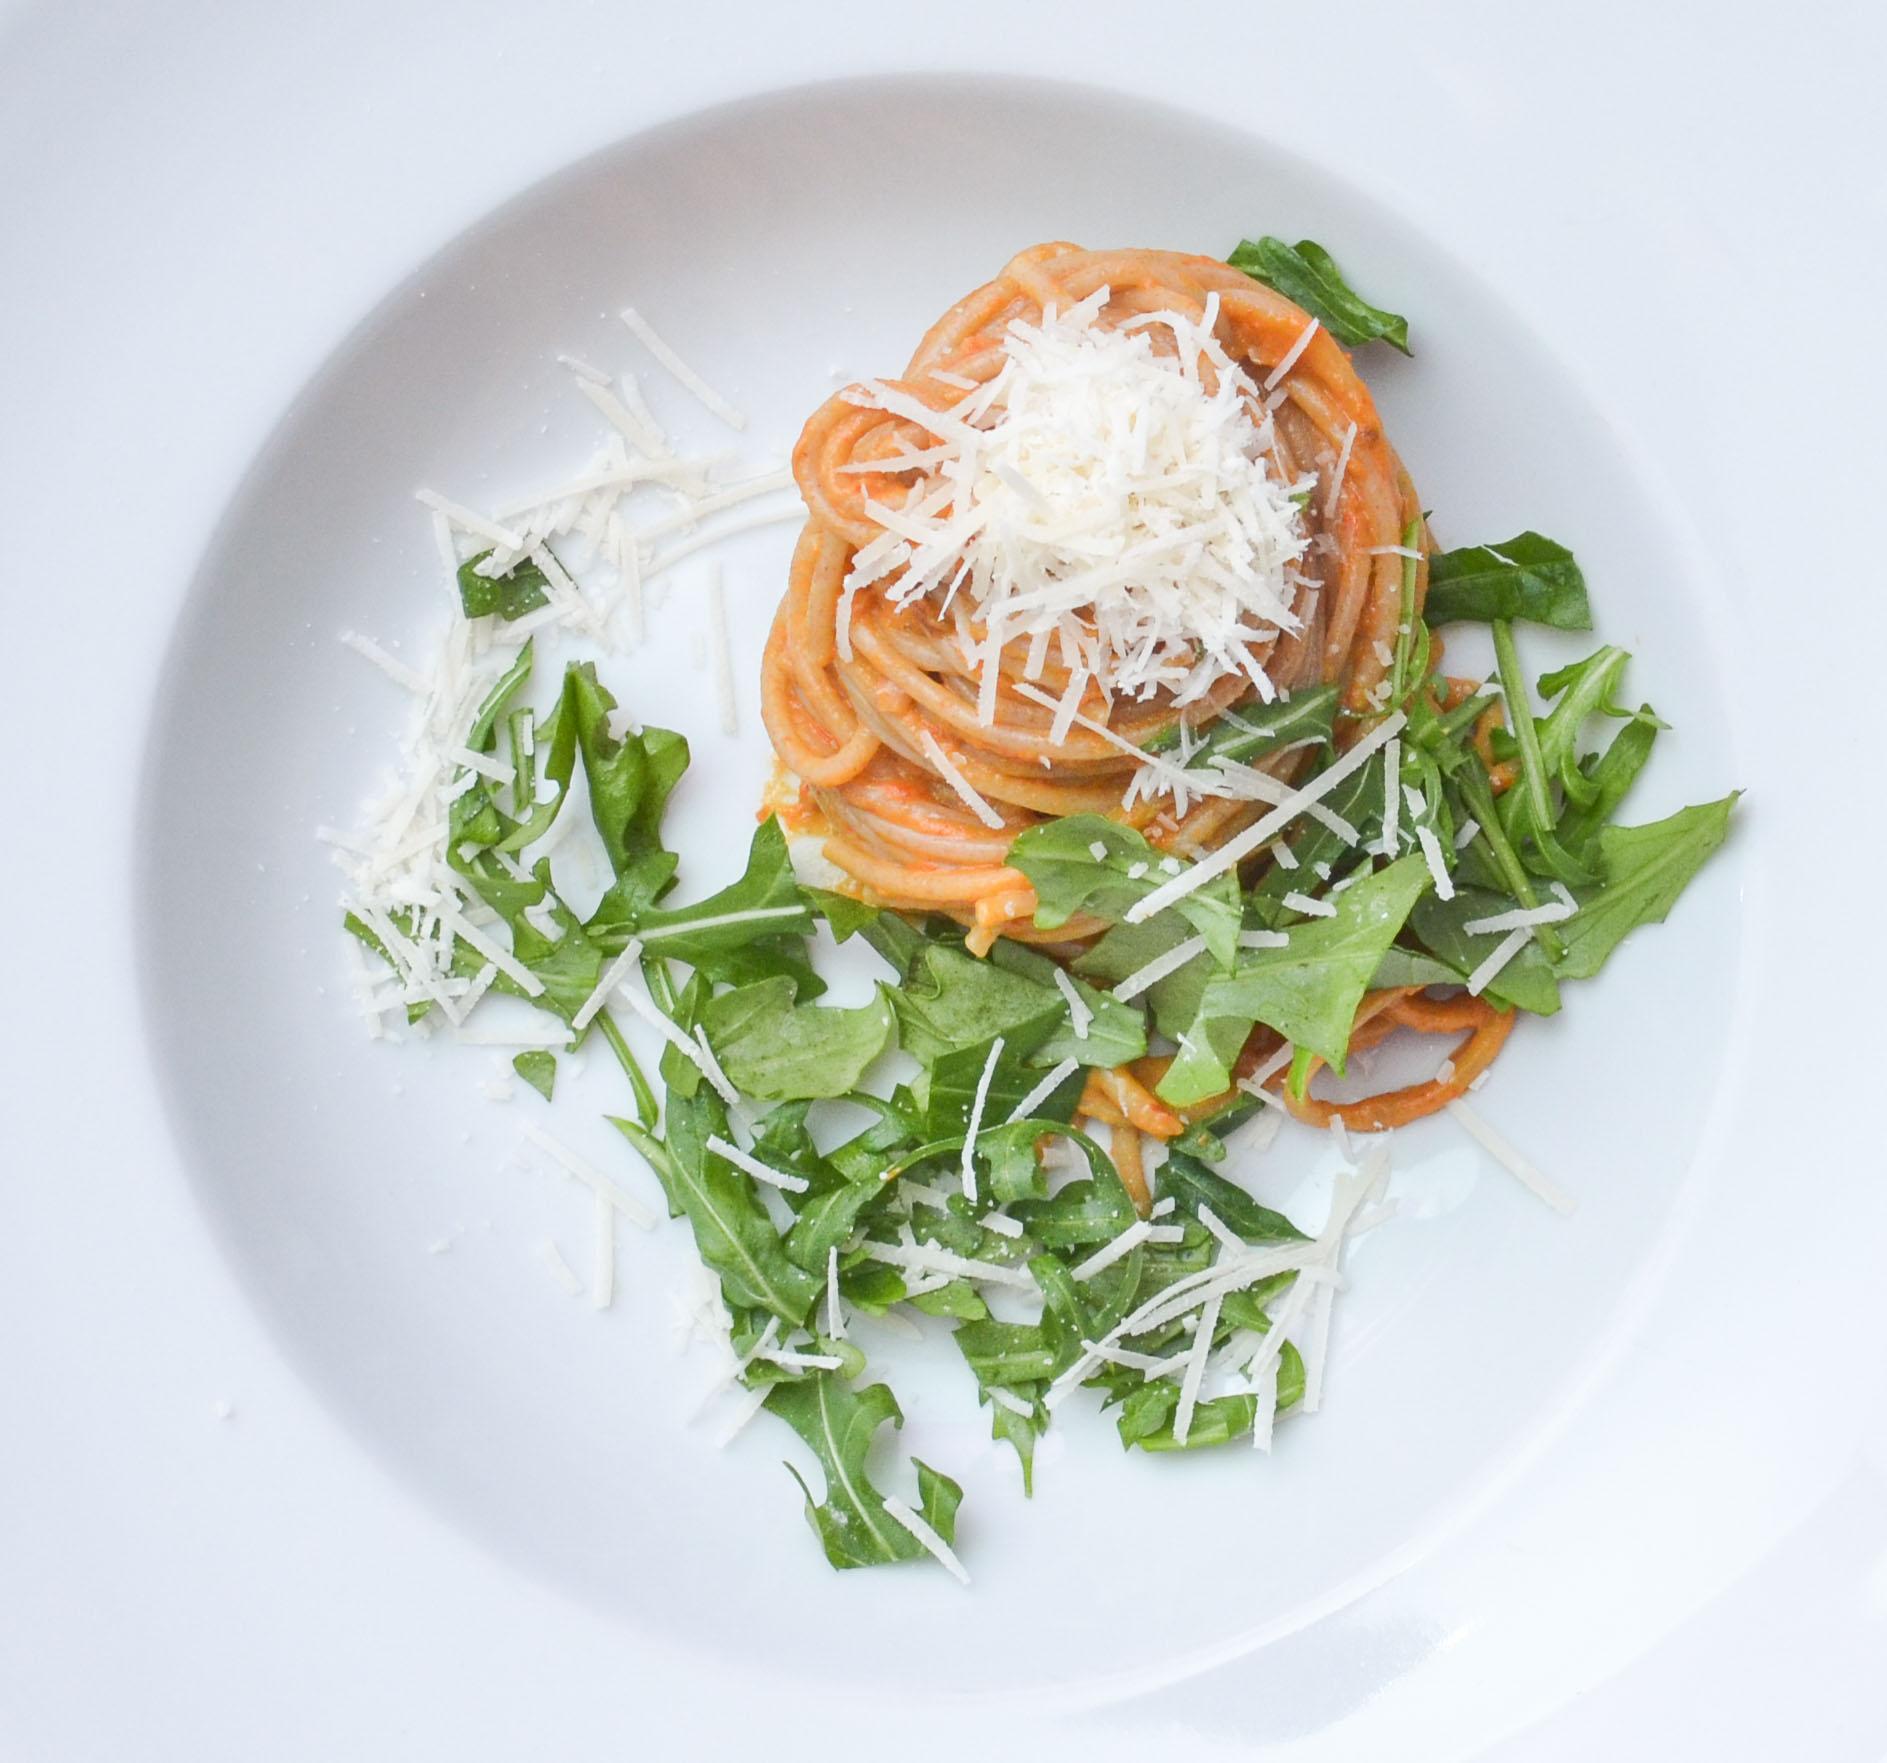 Spaghetti mit würziger Erdnuss-Paprika-Sauce